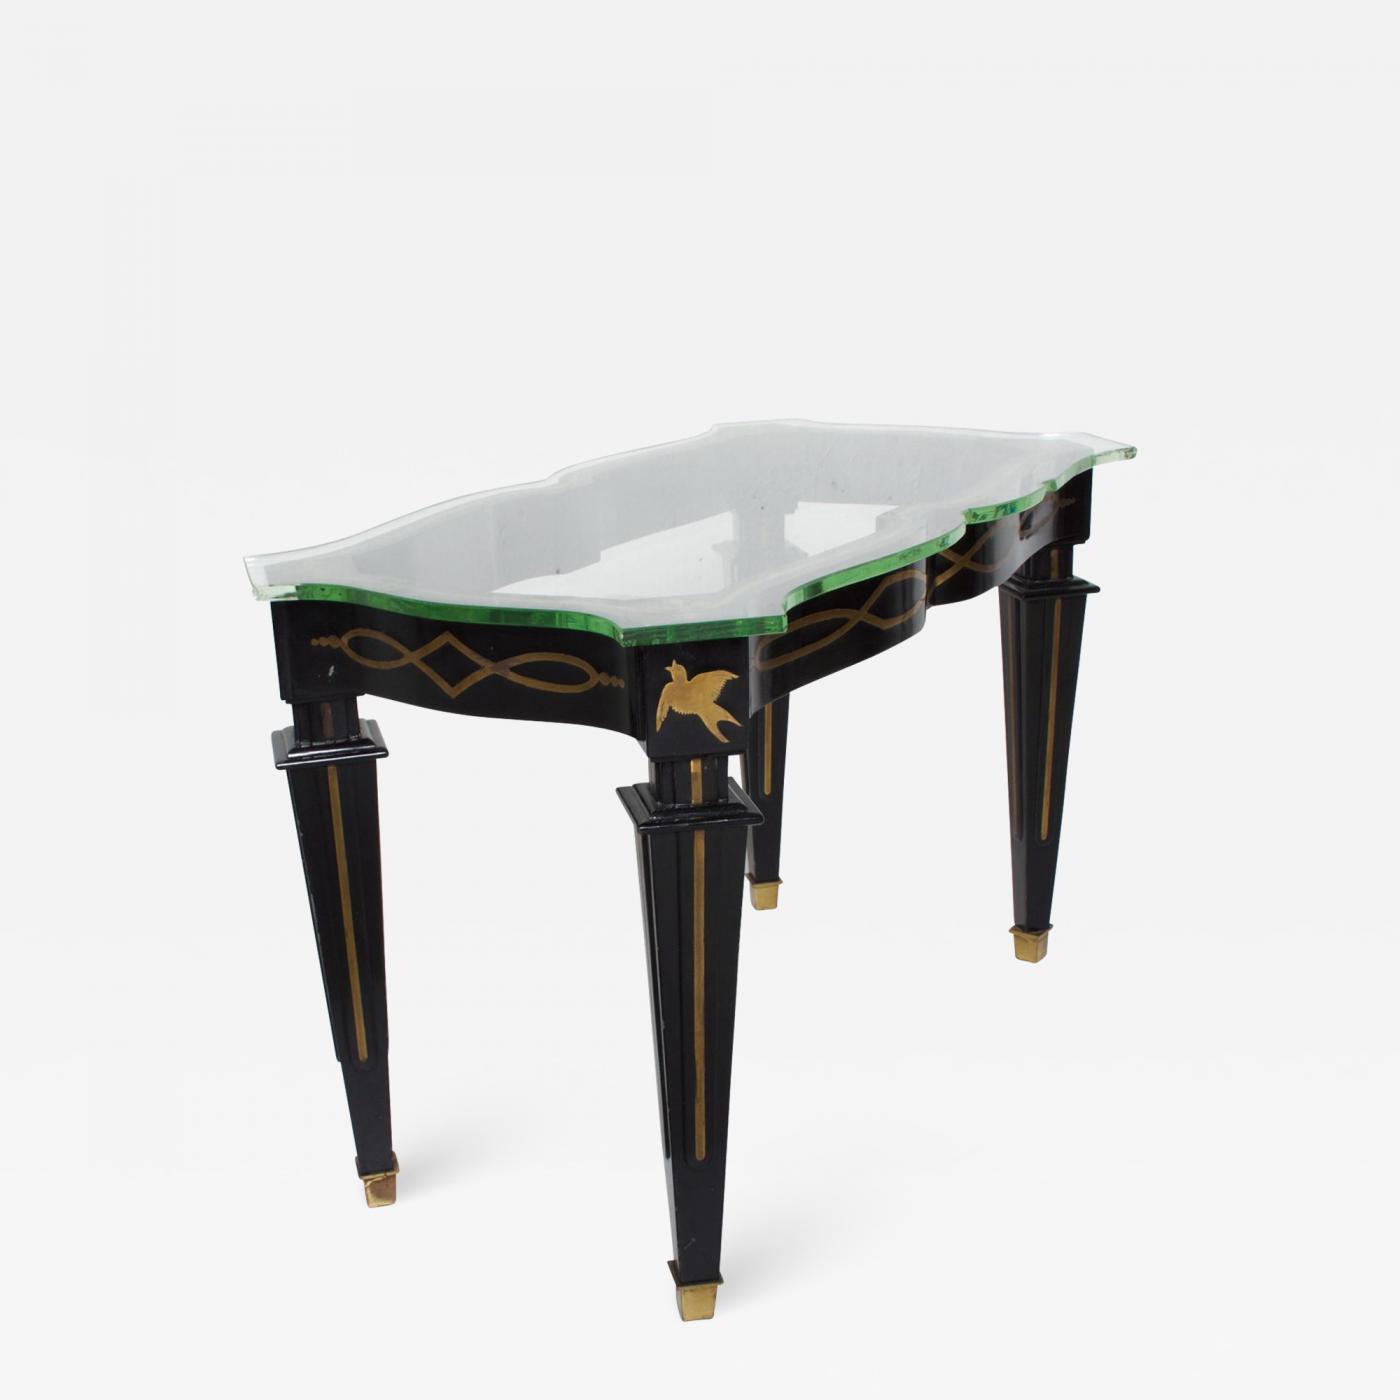 Marvelous Arturo Pani Mid Century Mexican Modernist Side Table By Arturo Pani Fleur De Lis Caraccident5 Cool Chair Designs And Ideas Caraccident5Info